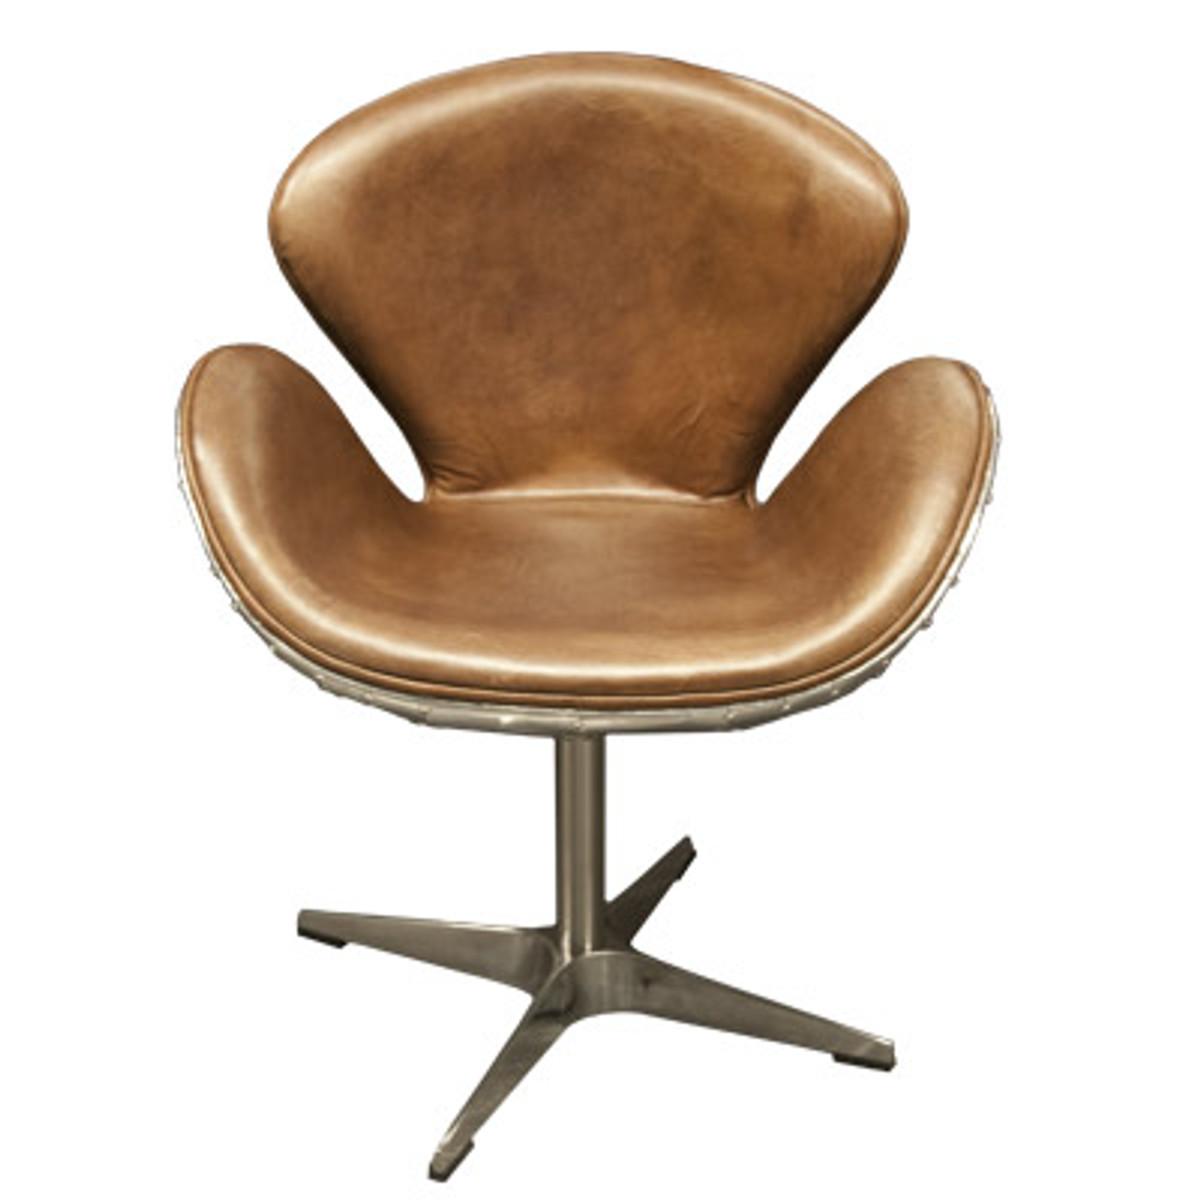 fauteuil de bureau art deco de luxe fauteuil pivotant en cuir veritable marron clair aluminium fauteuil pivotant fauteuil de direction